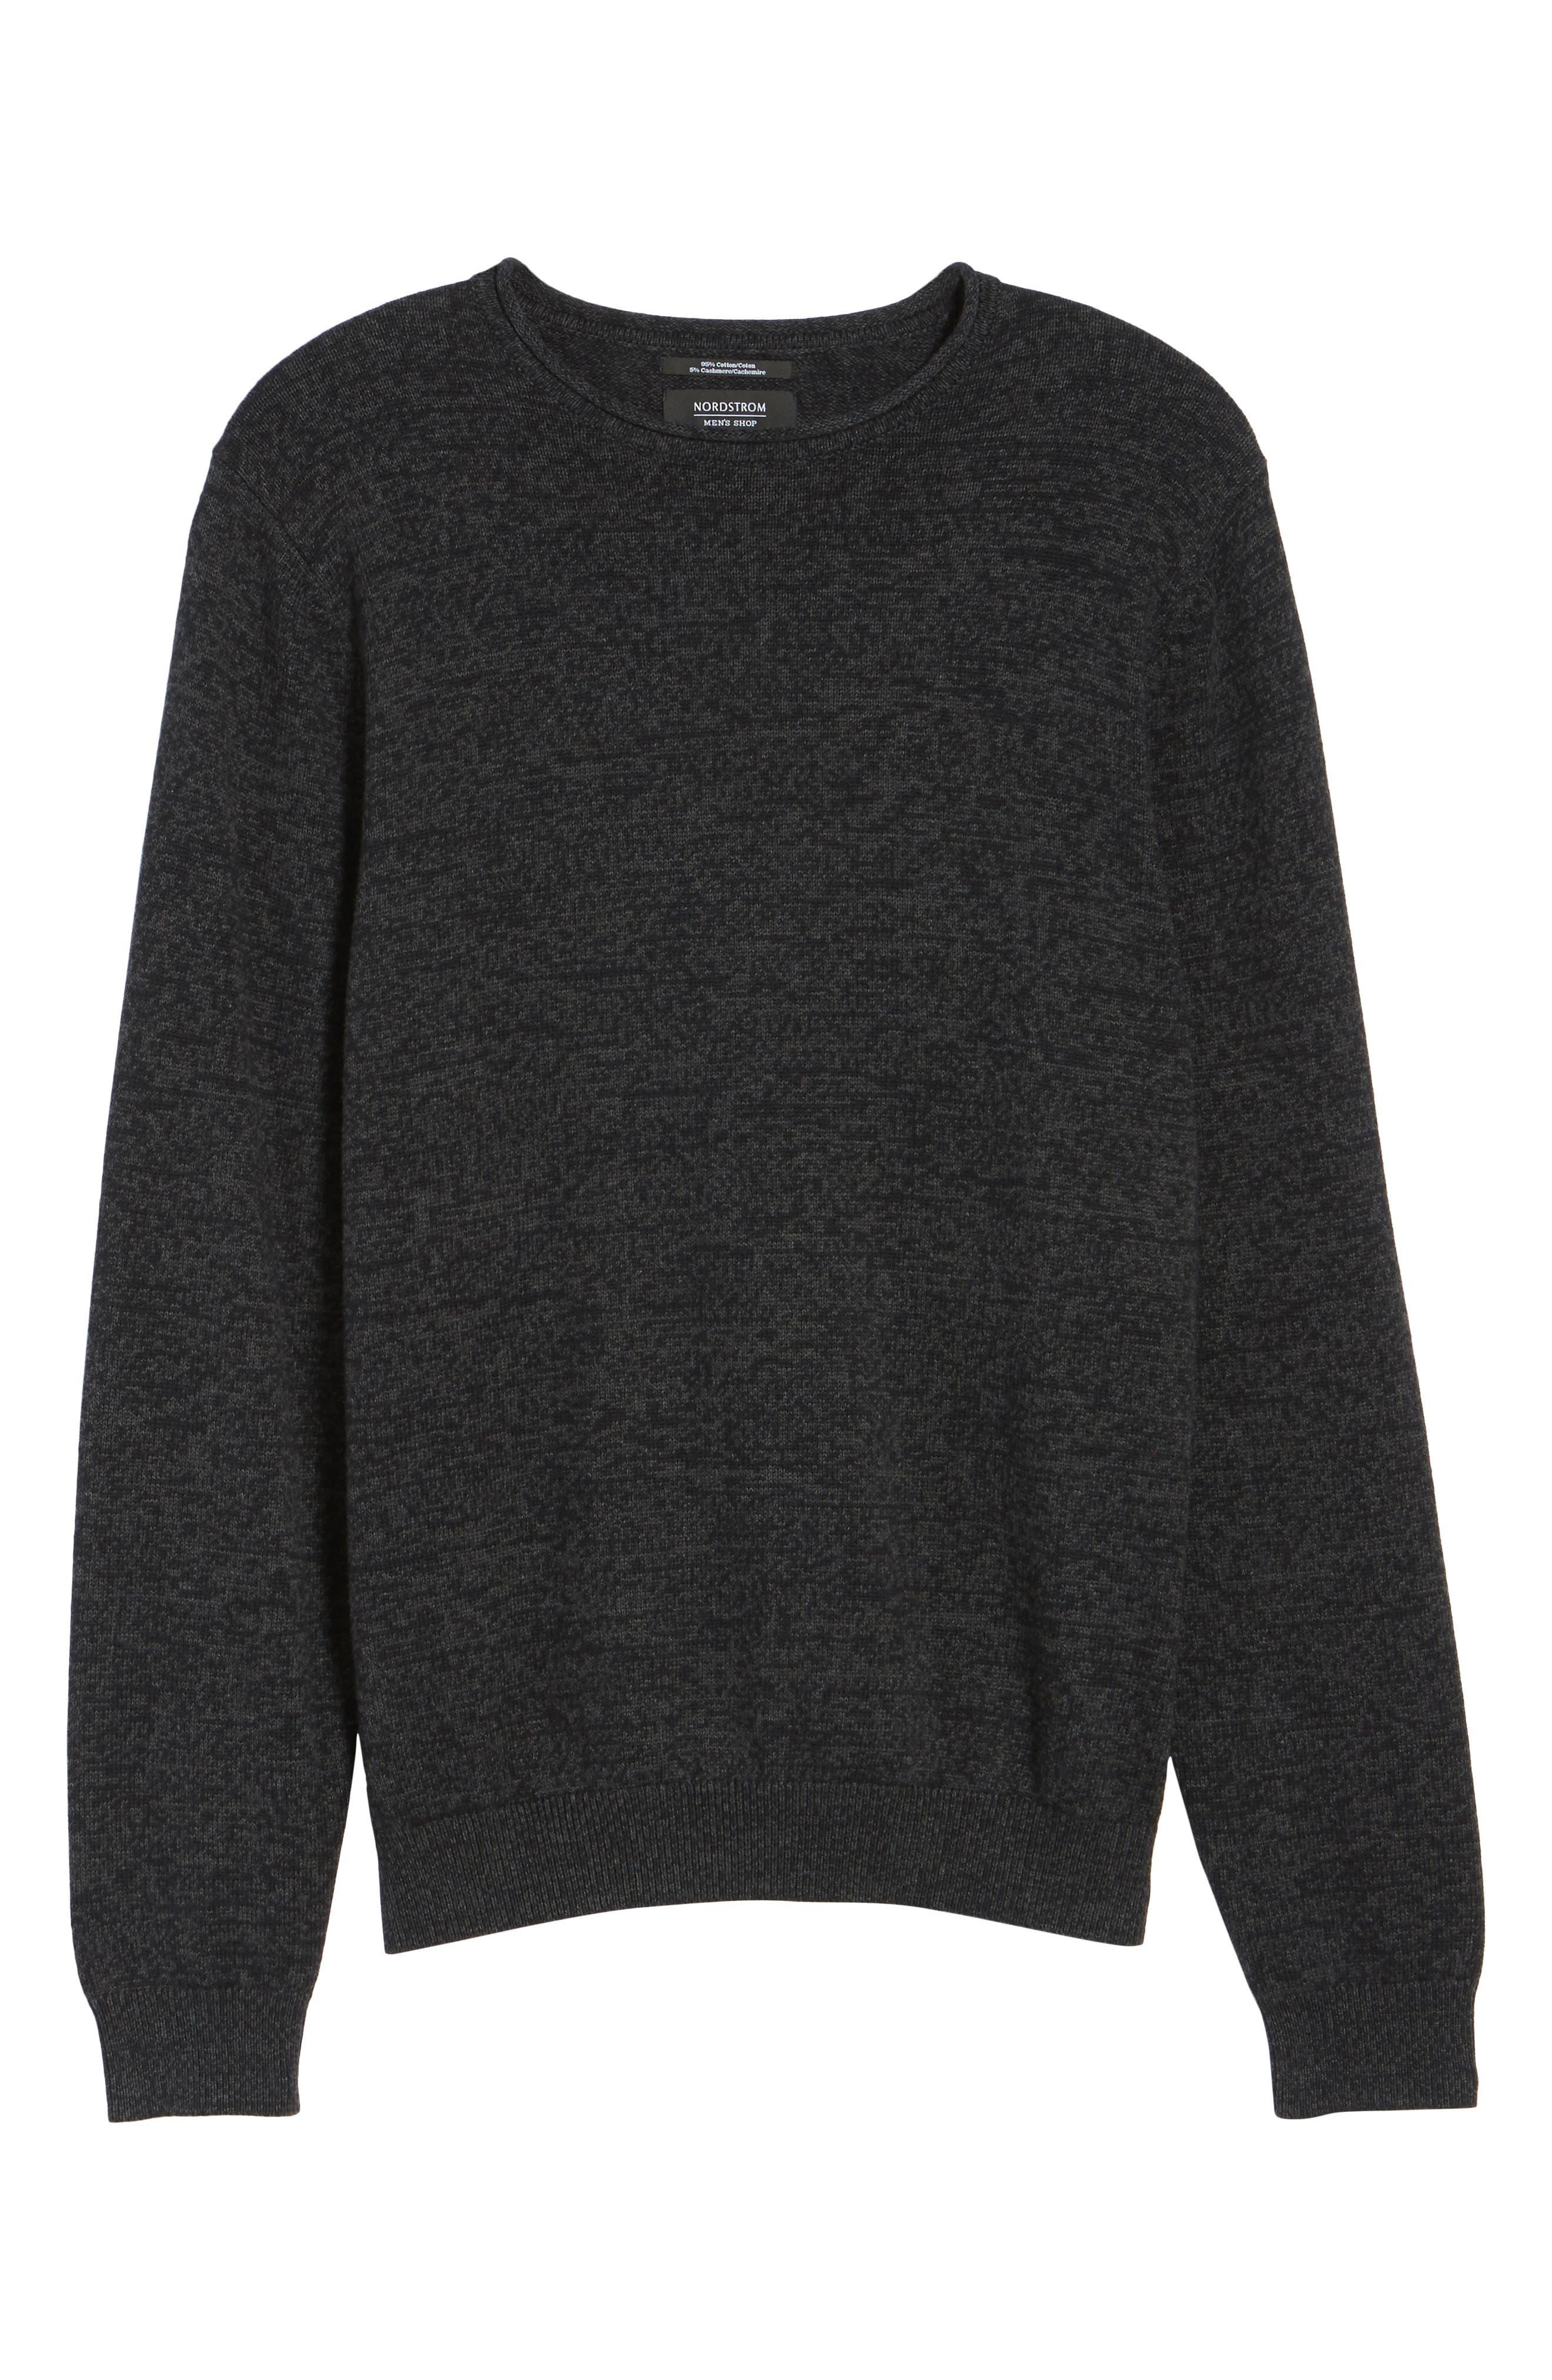 Cotton & Cashmere Roll Neck Sweater,                             Alternate thumbnail 6, color,                             021